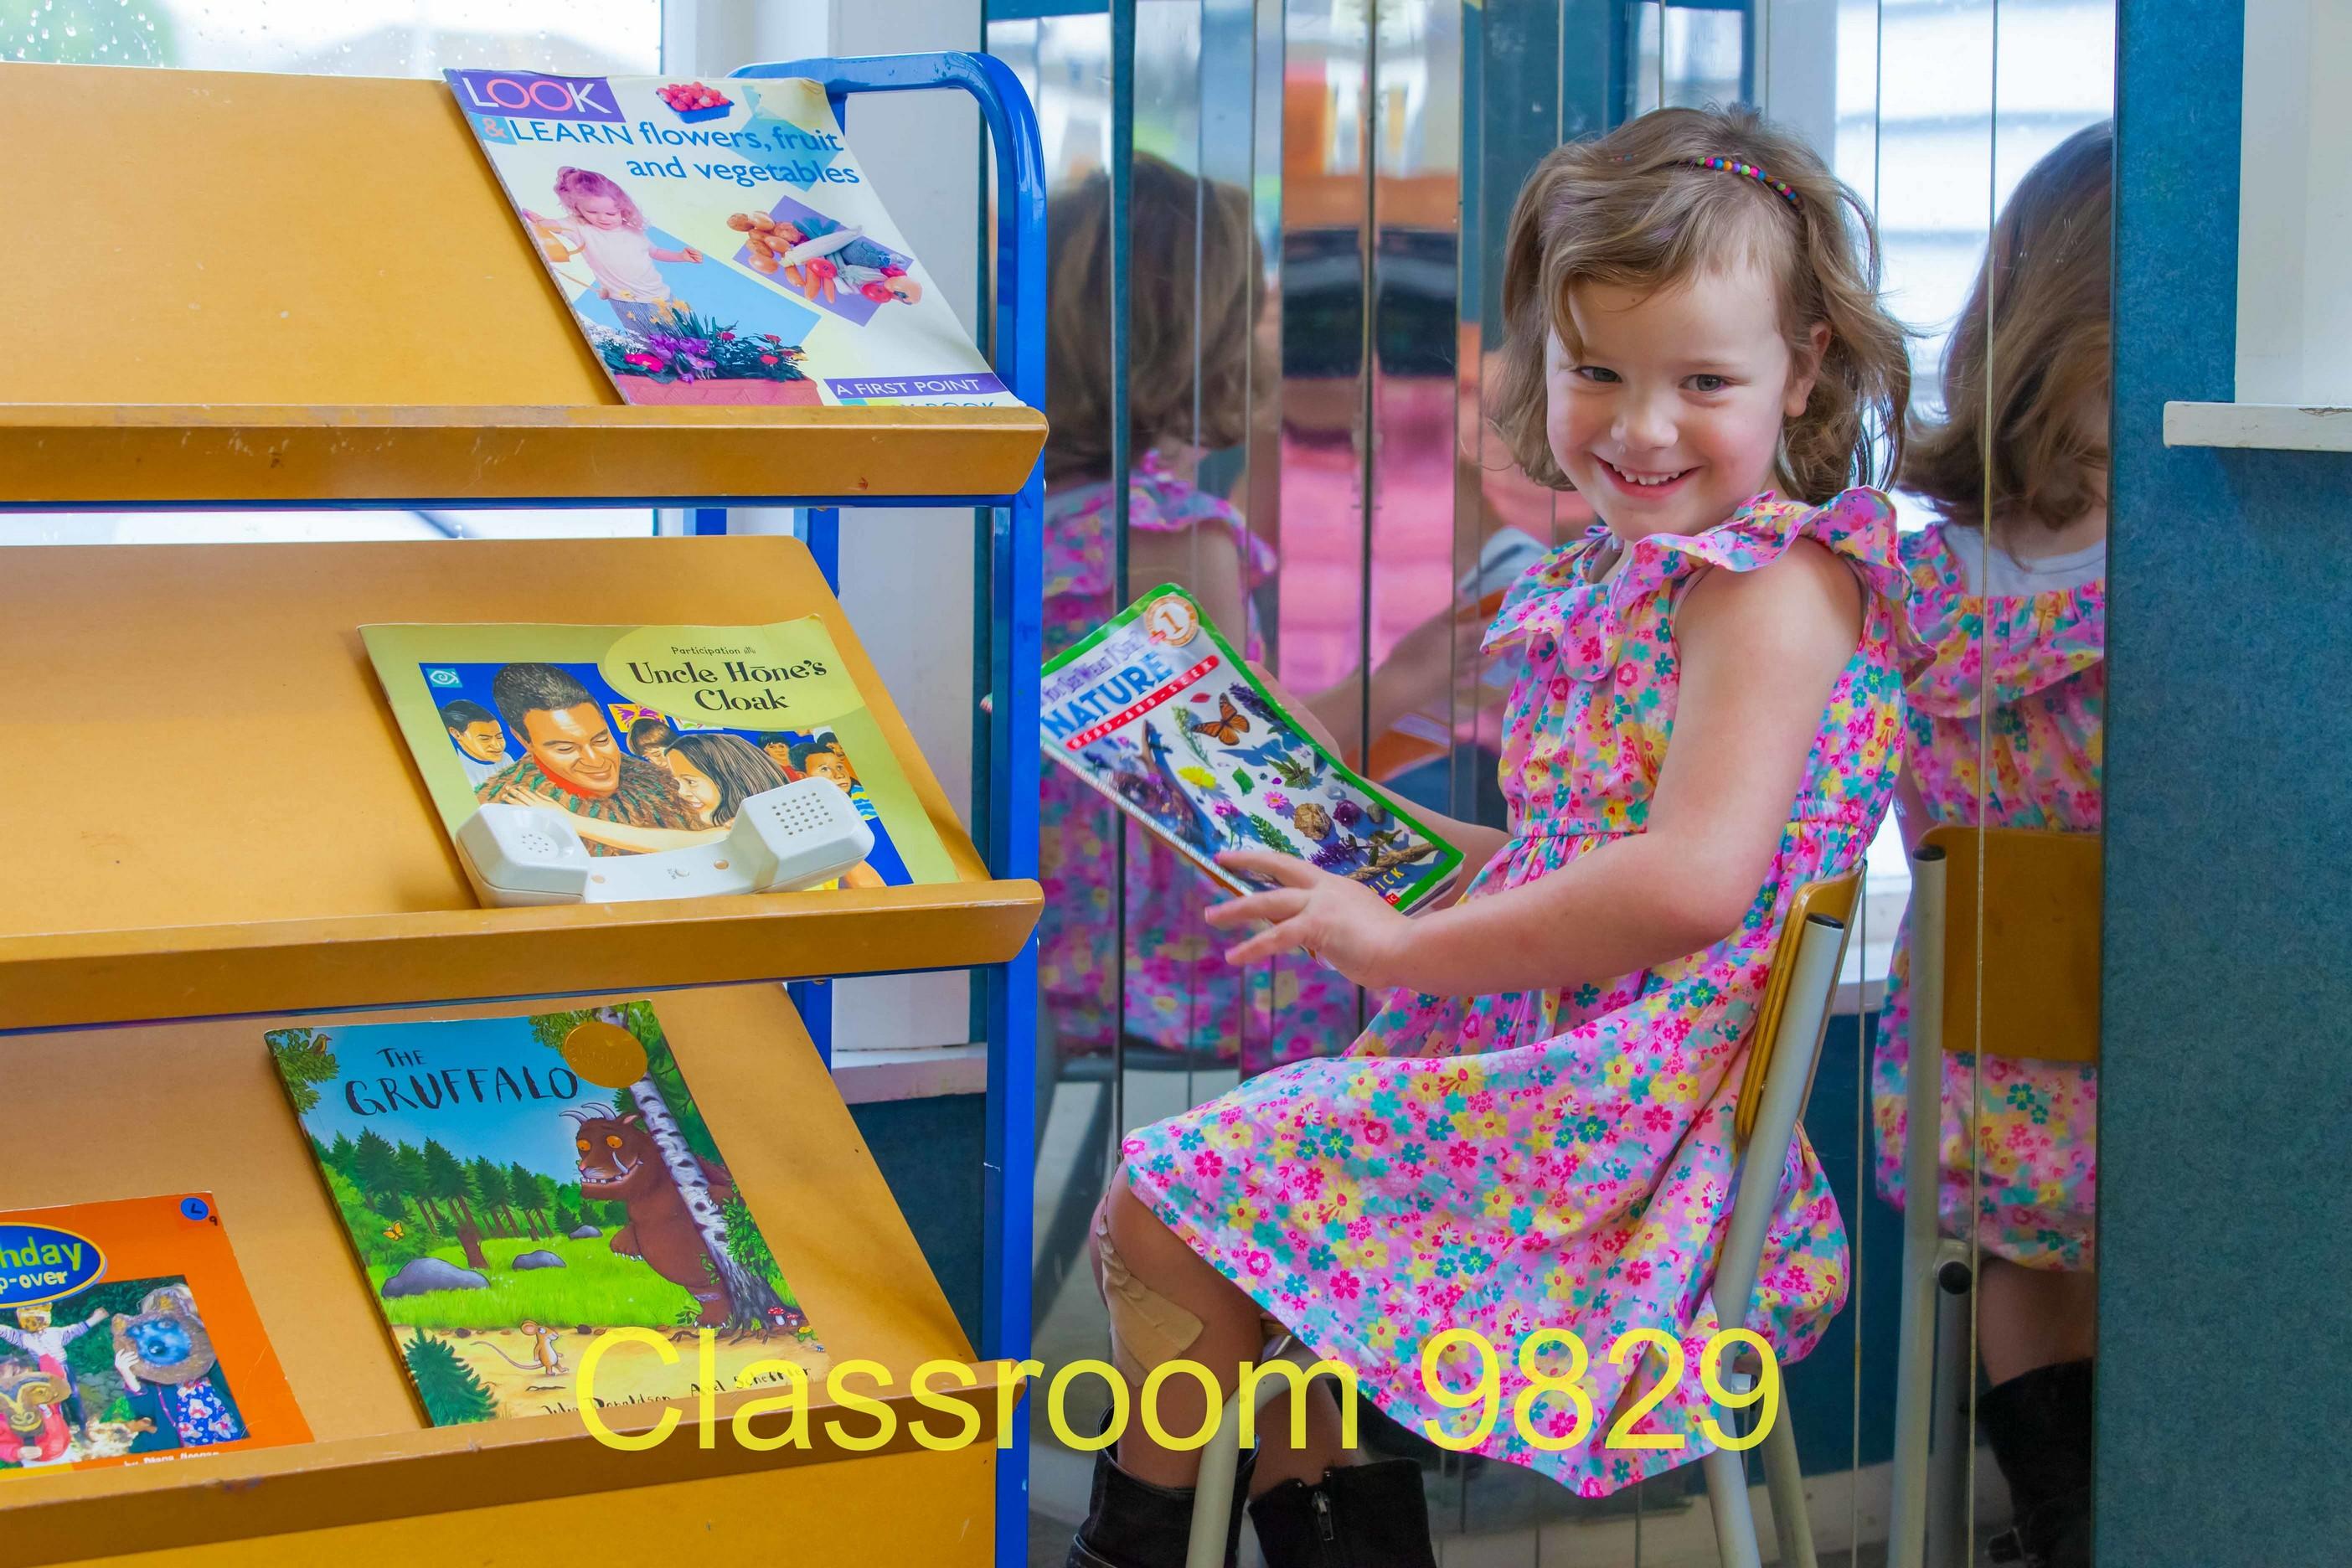 Classroom 9829